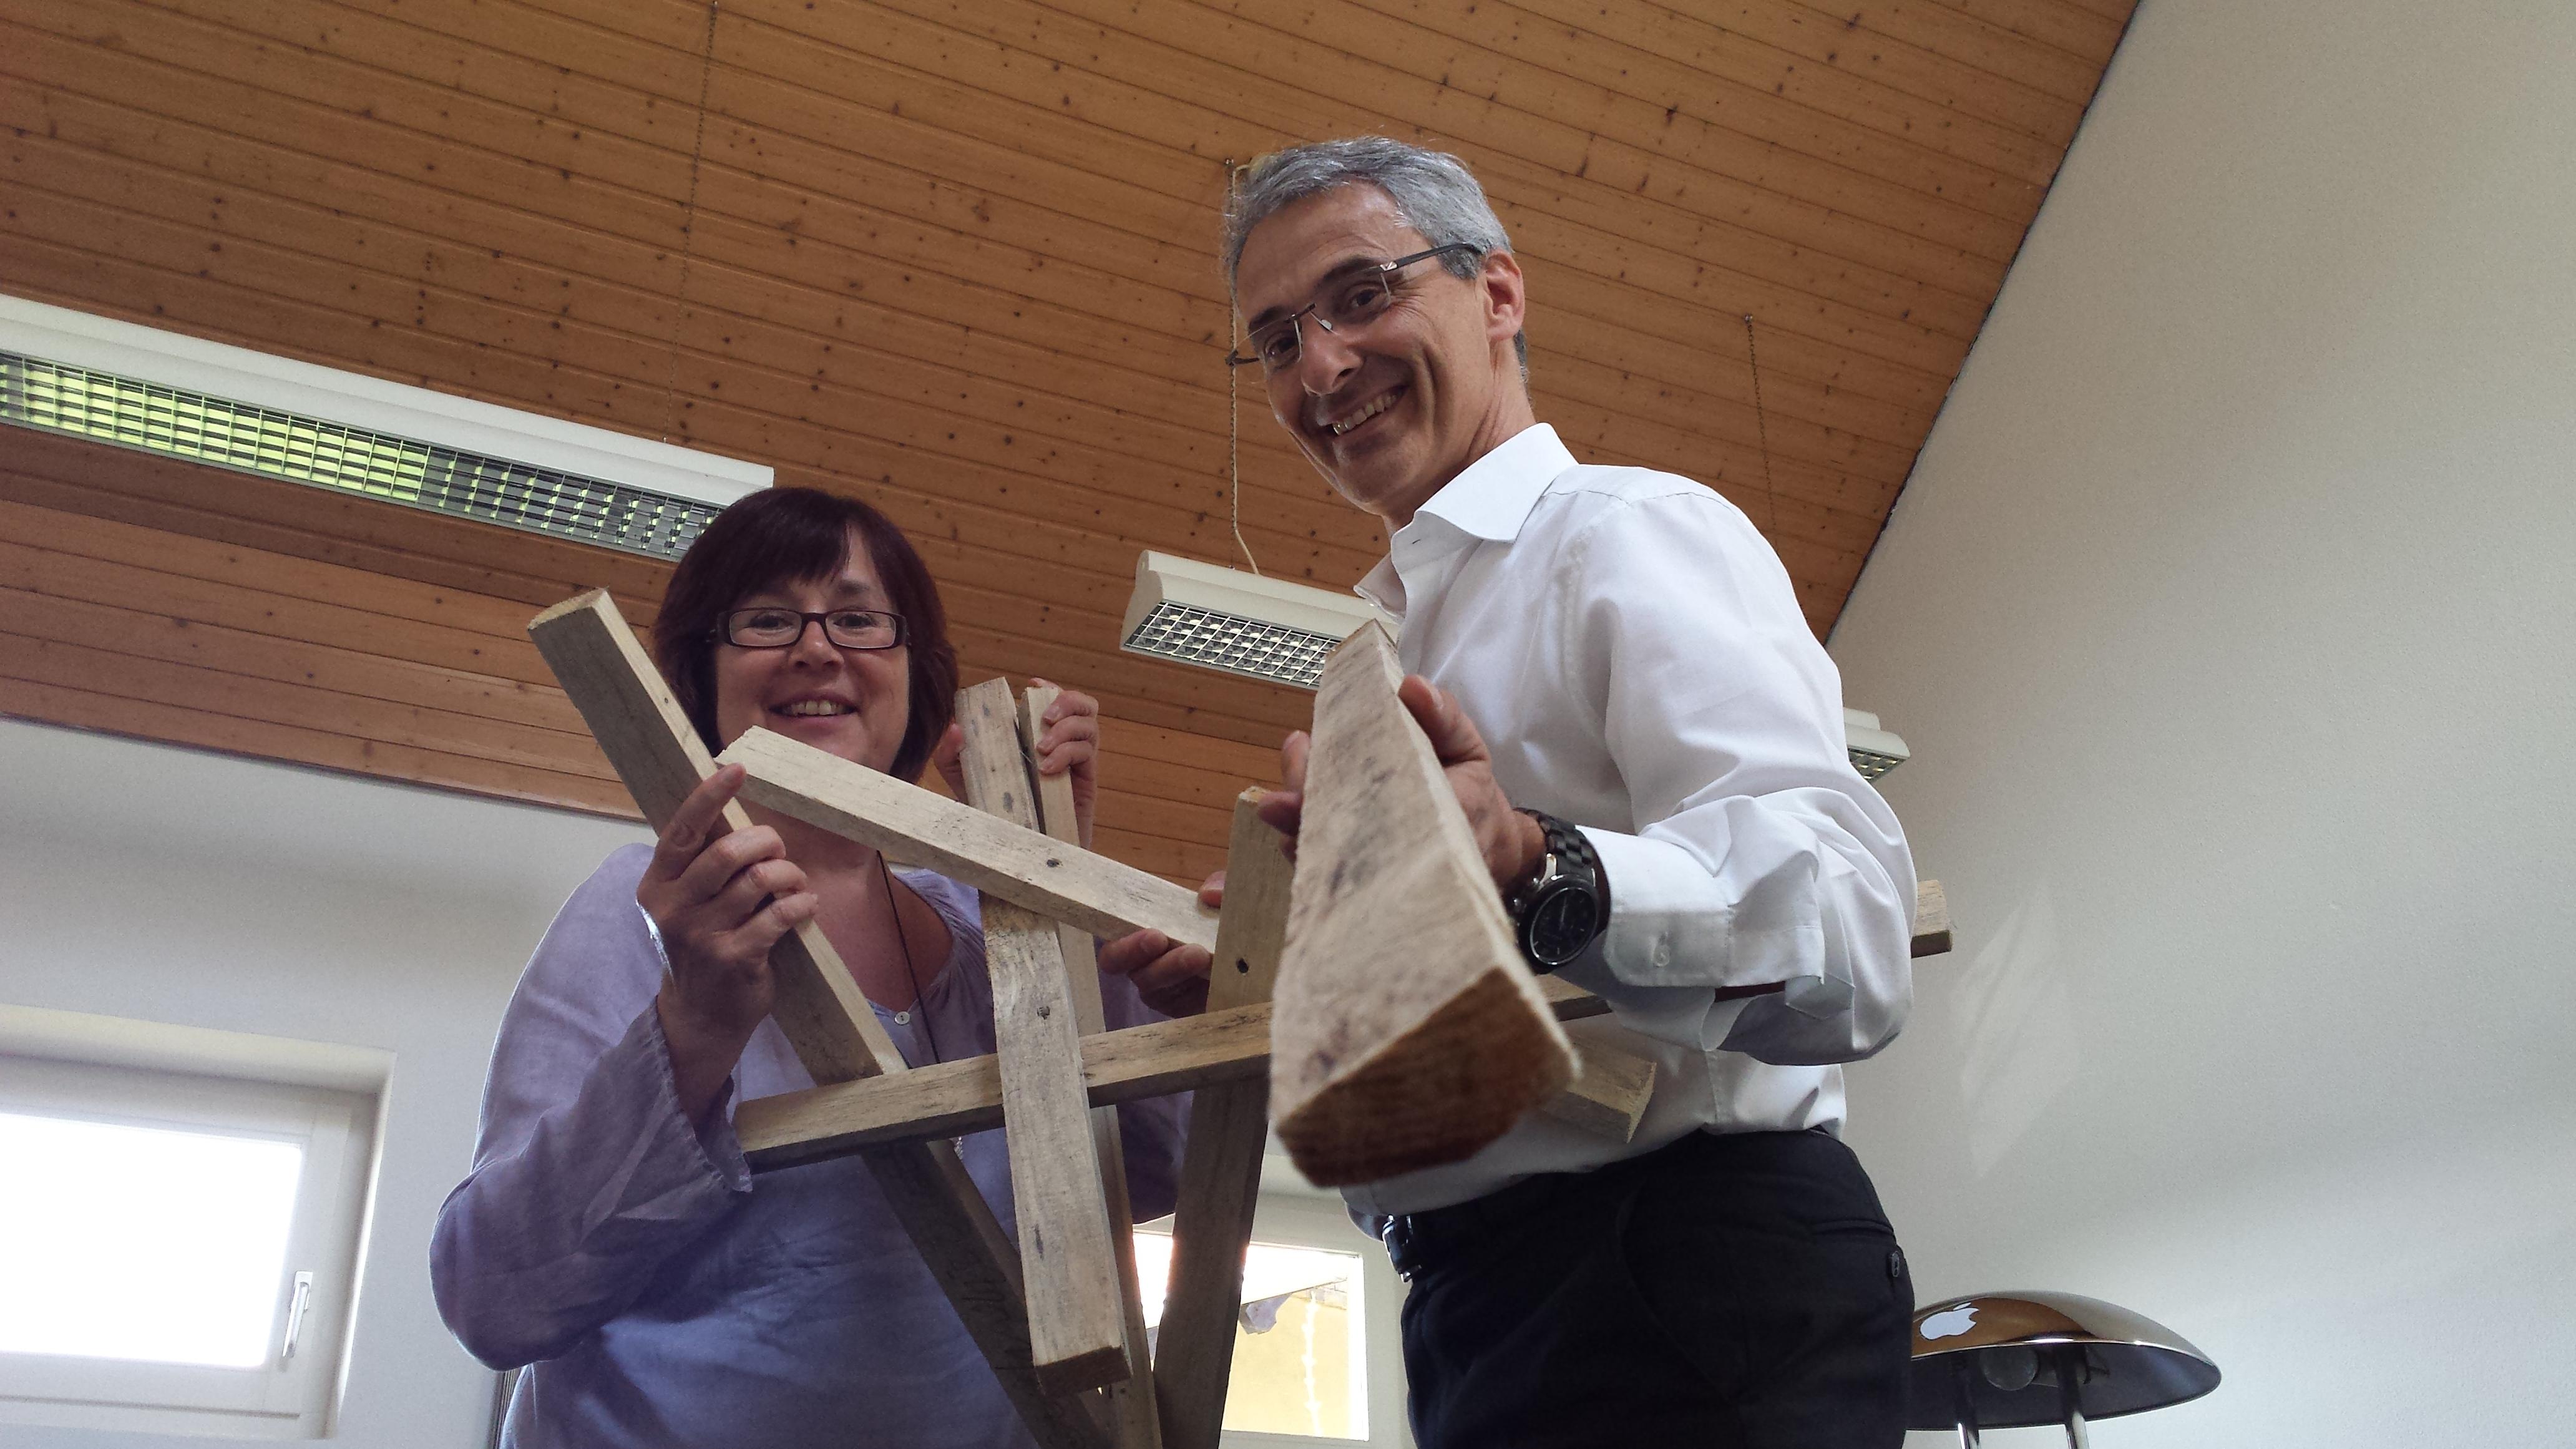 8. Mai 2015 16:00 Uhr: Woodencloud startet am St. Johanner Markt Saarbrücken